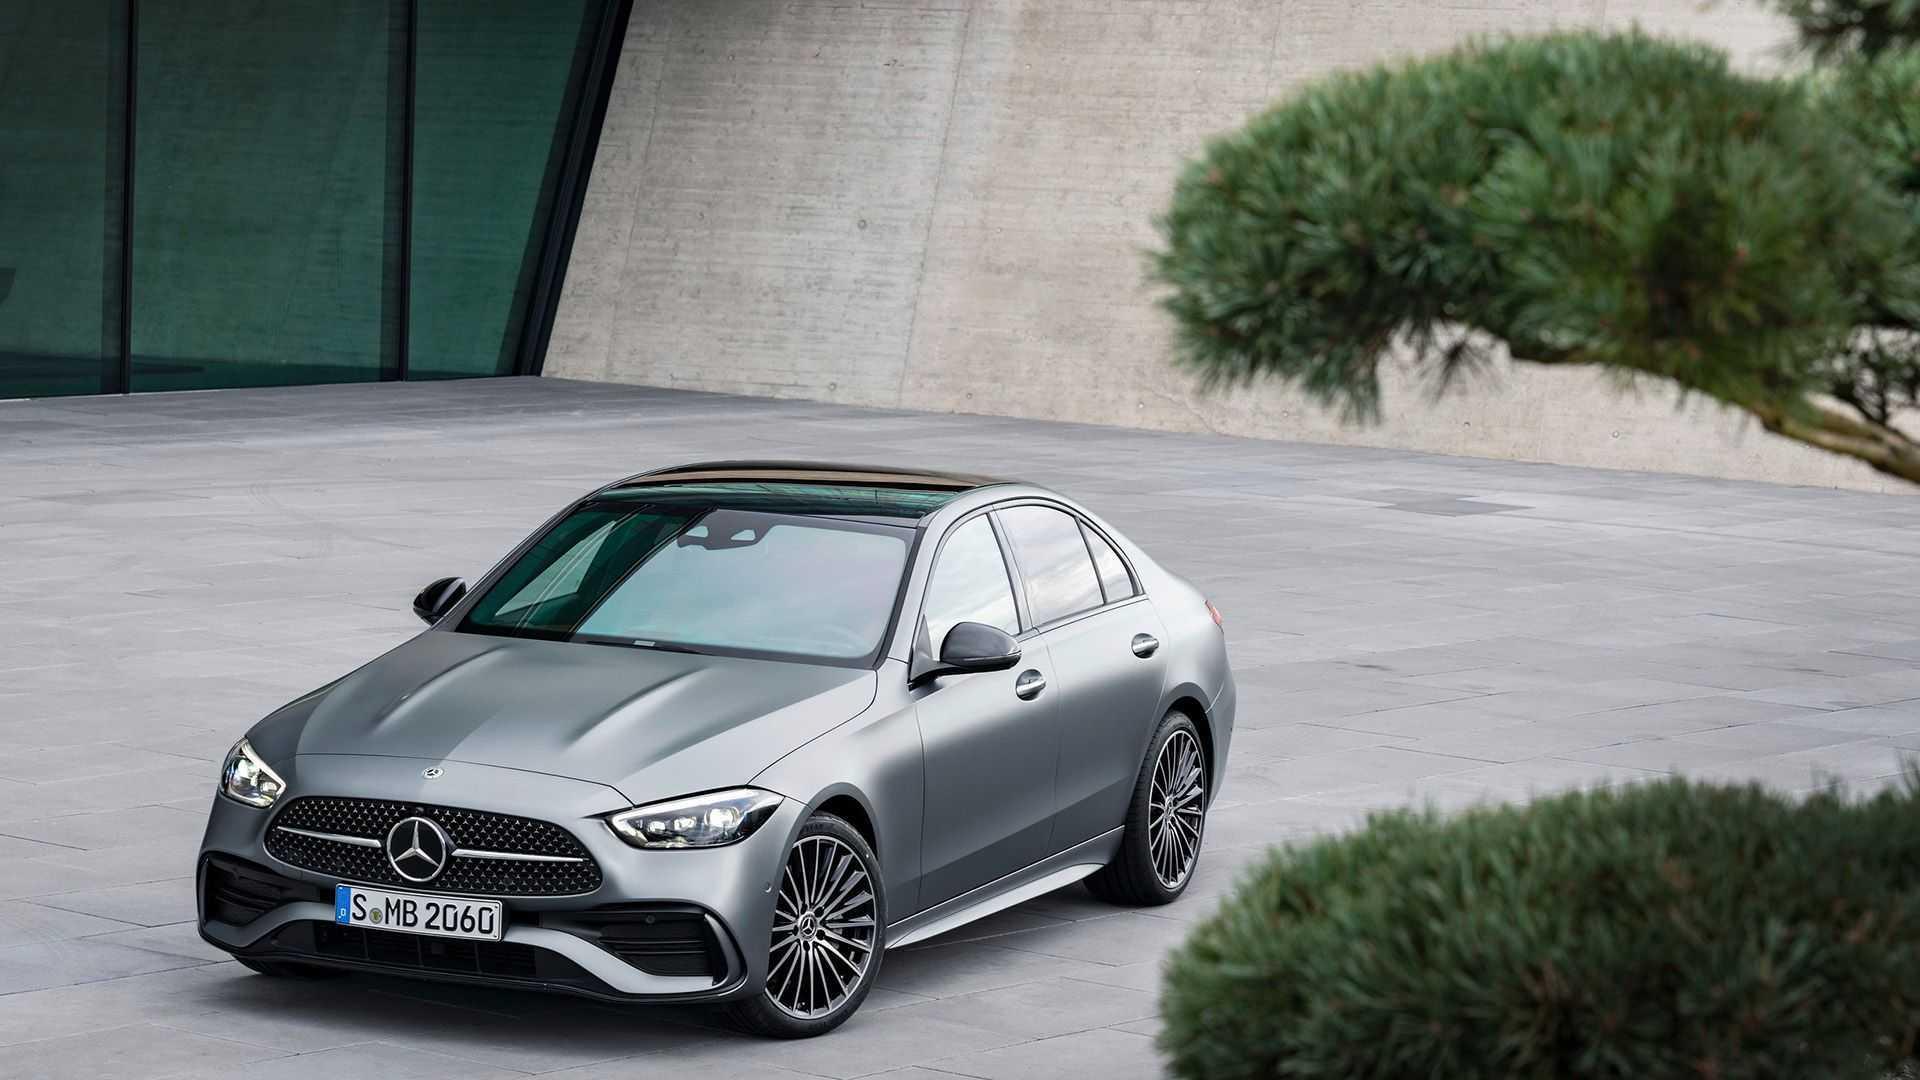 Mercedes-Benz построит электрический С-Class на новой платформе